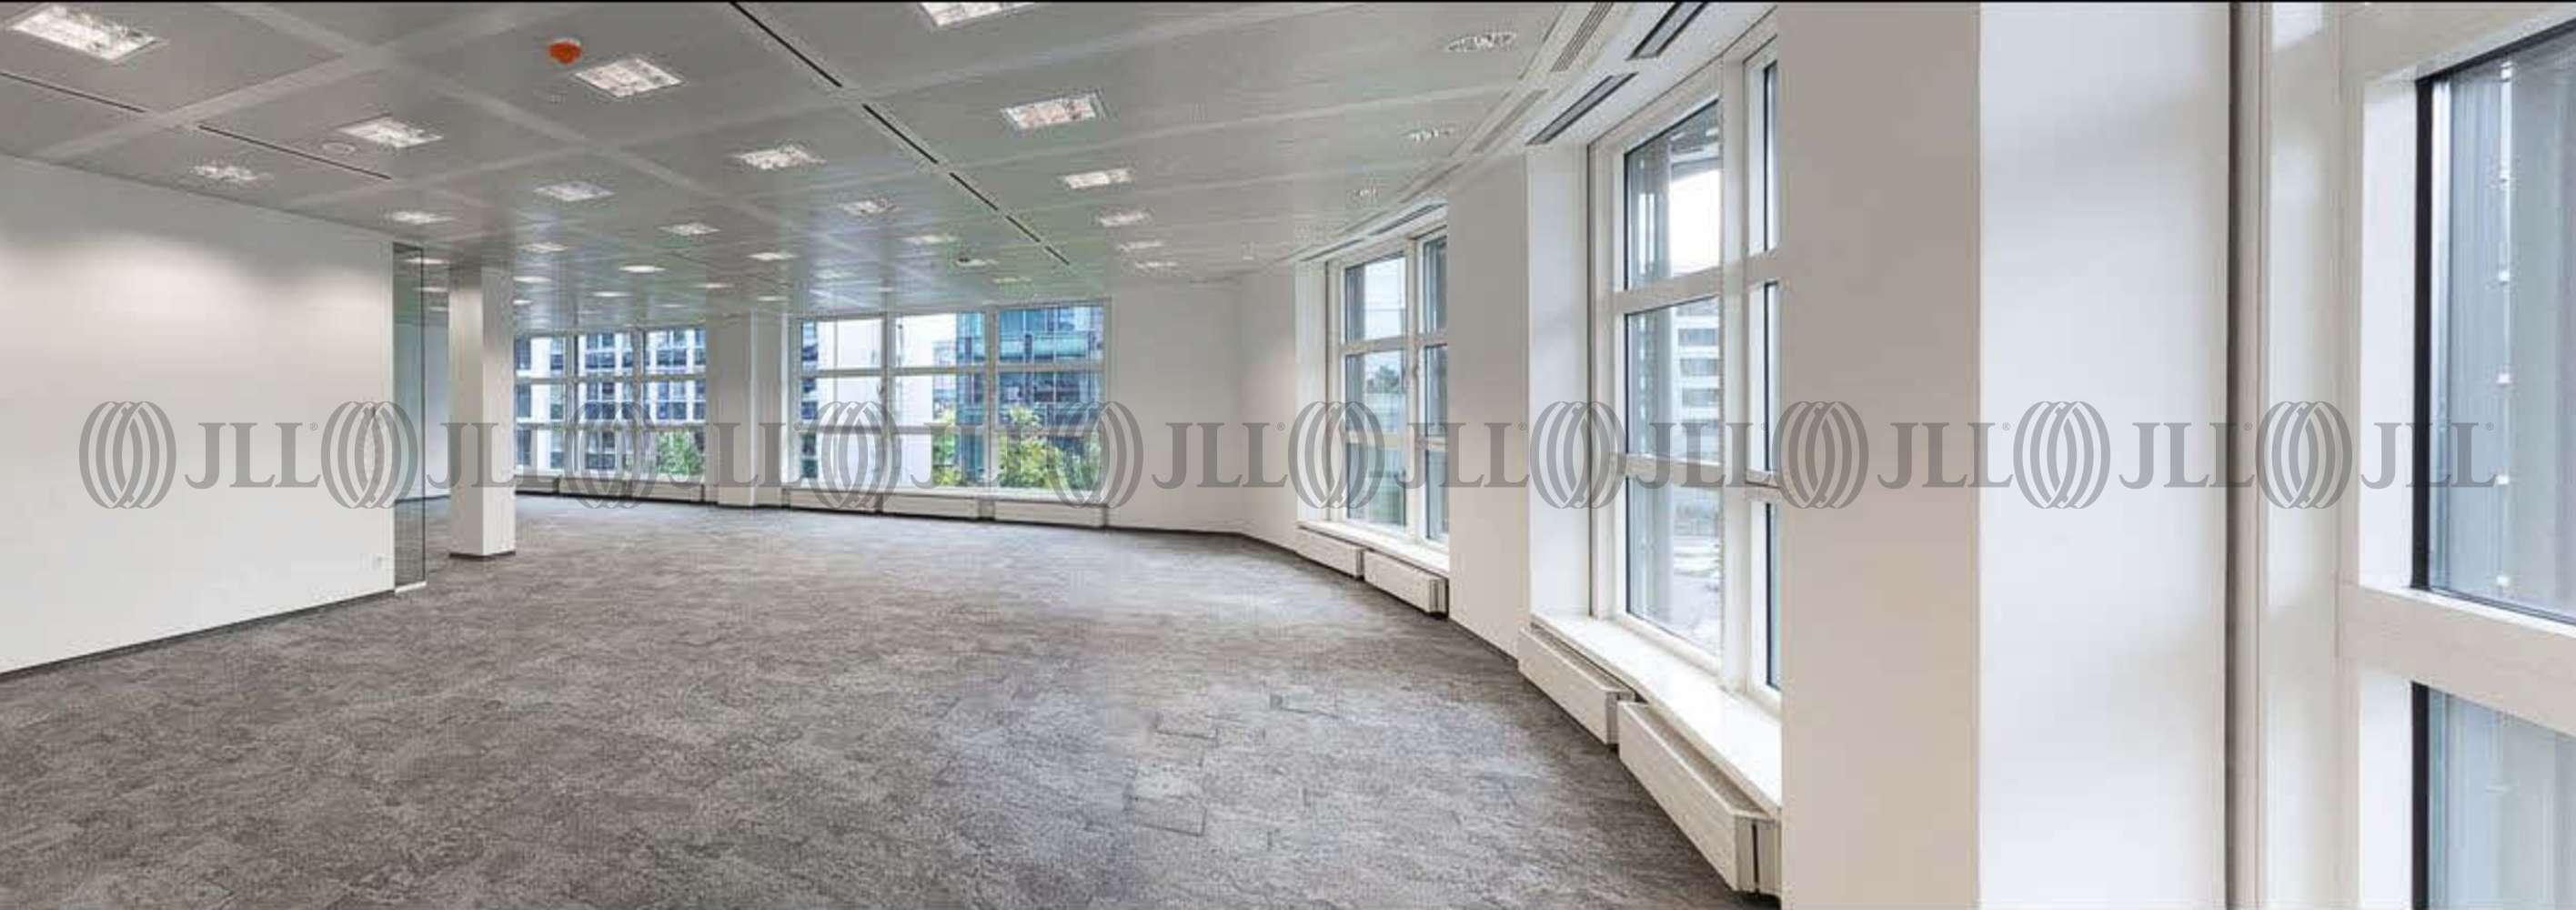 Büros Frankfurt am main, 60325 - Büro - Frankfurt am Main, Westend-Süd - F1786 - 9885324